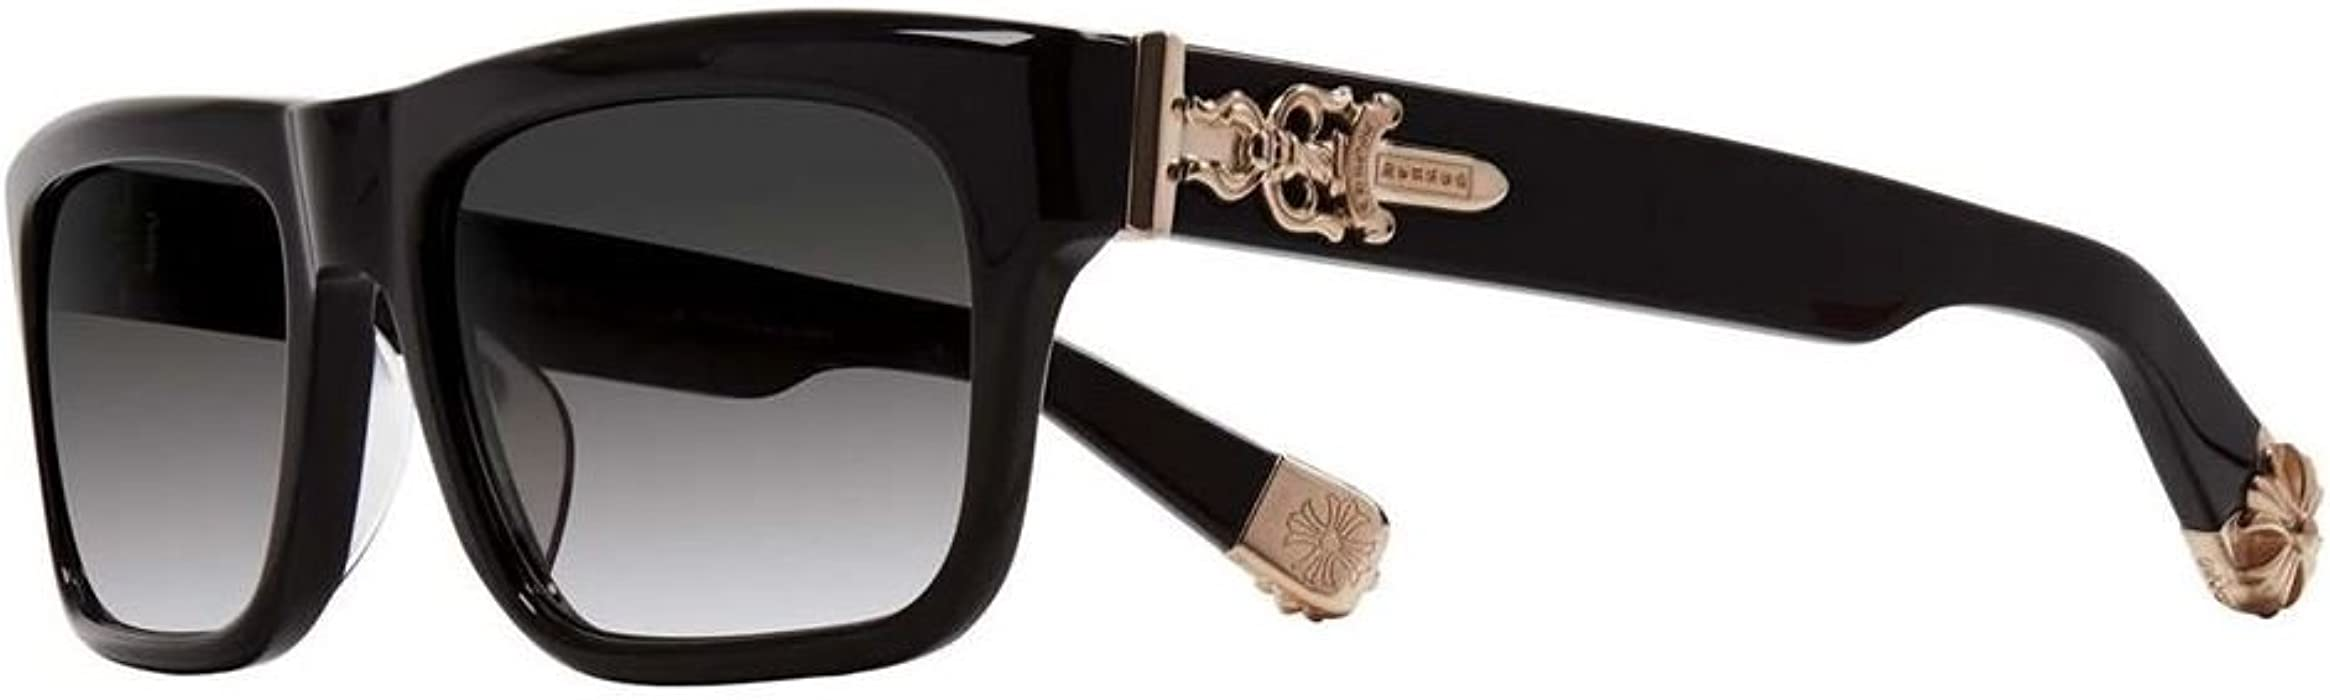 e5526b4c6b75 Chrome Hearts - Sluss Bussin - Sunglasses (Black - Gold Plated